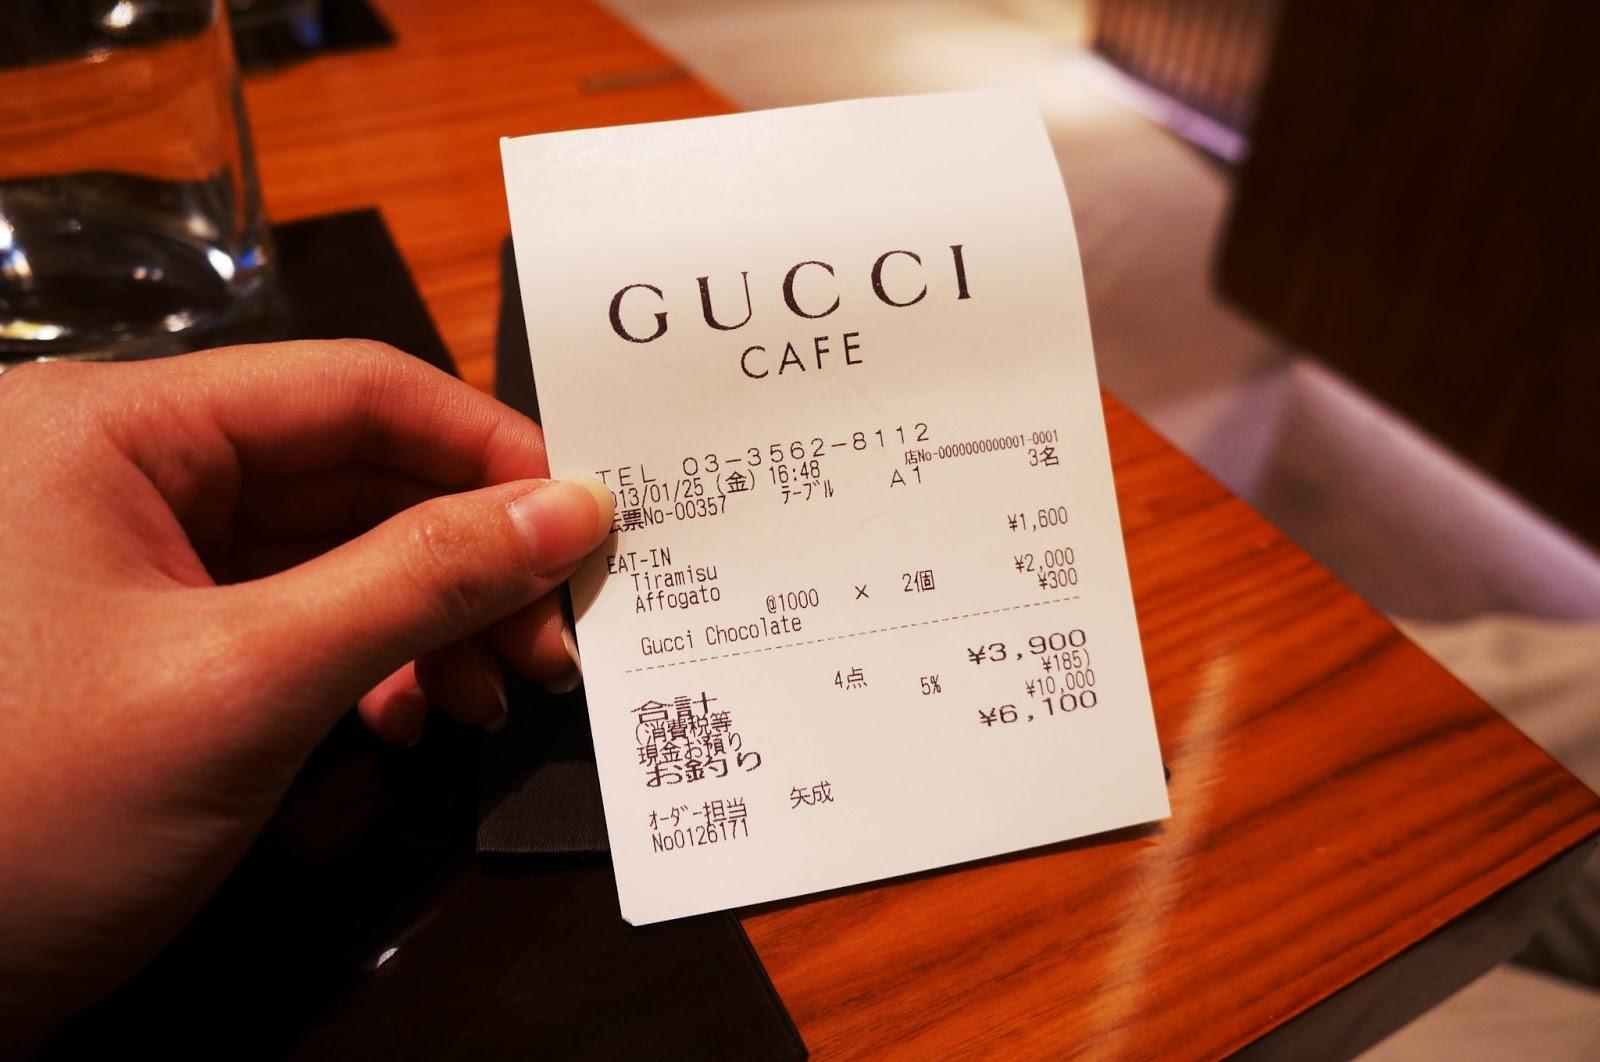 Gucci Cafe Florence Menu